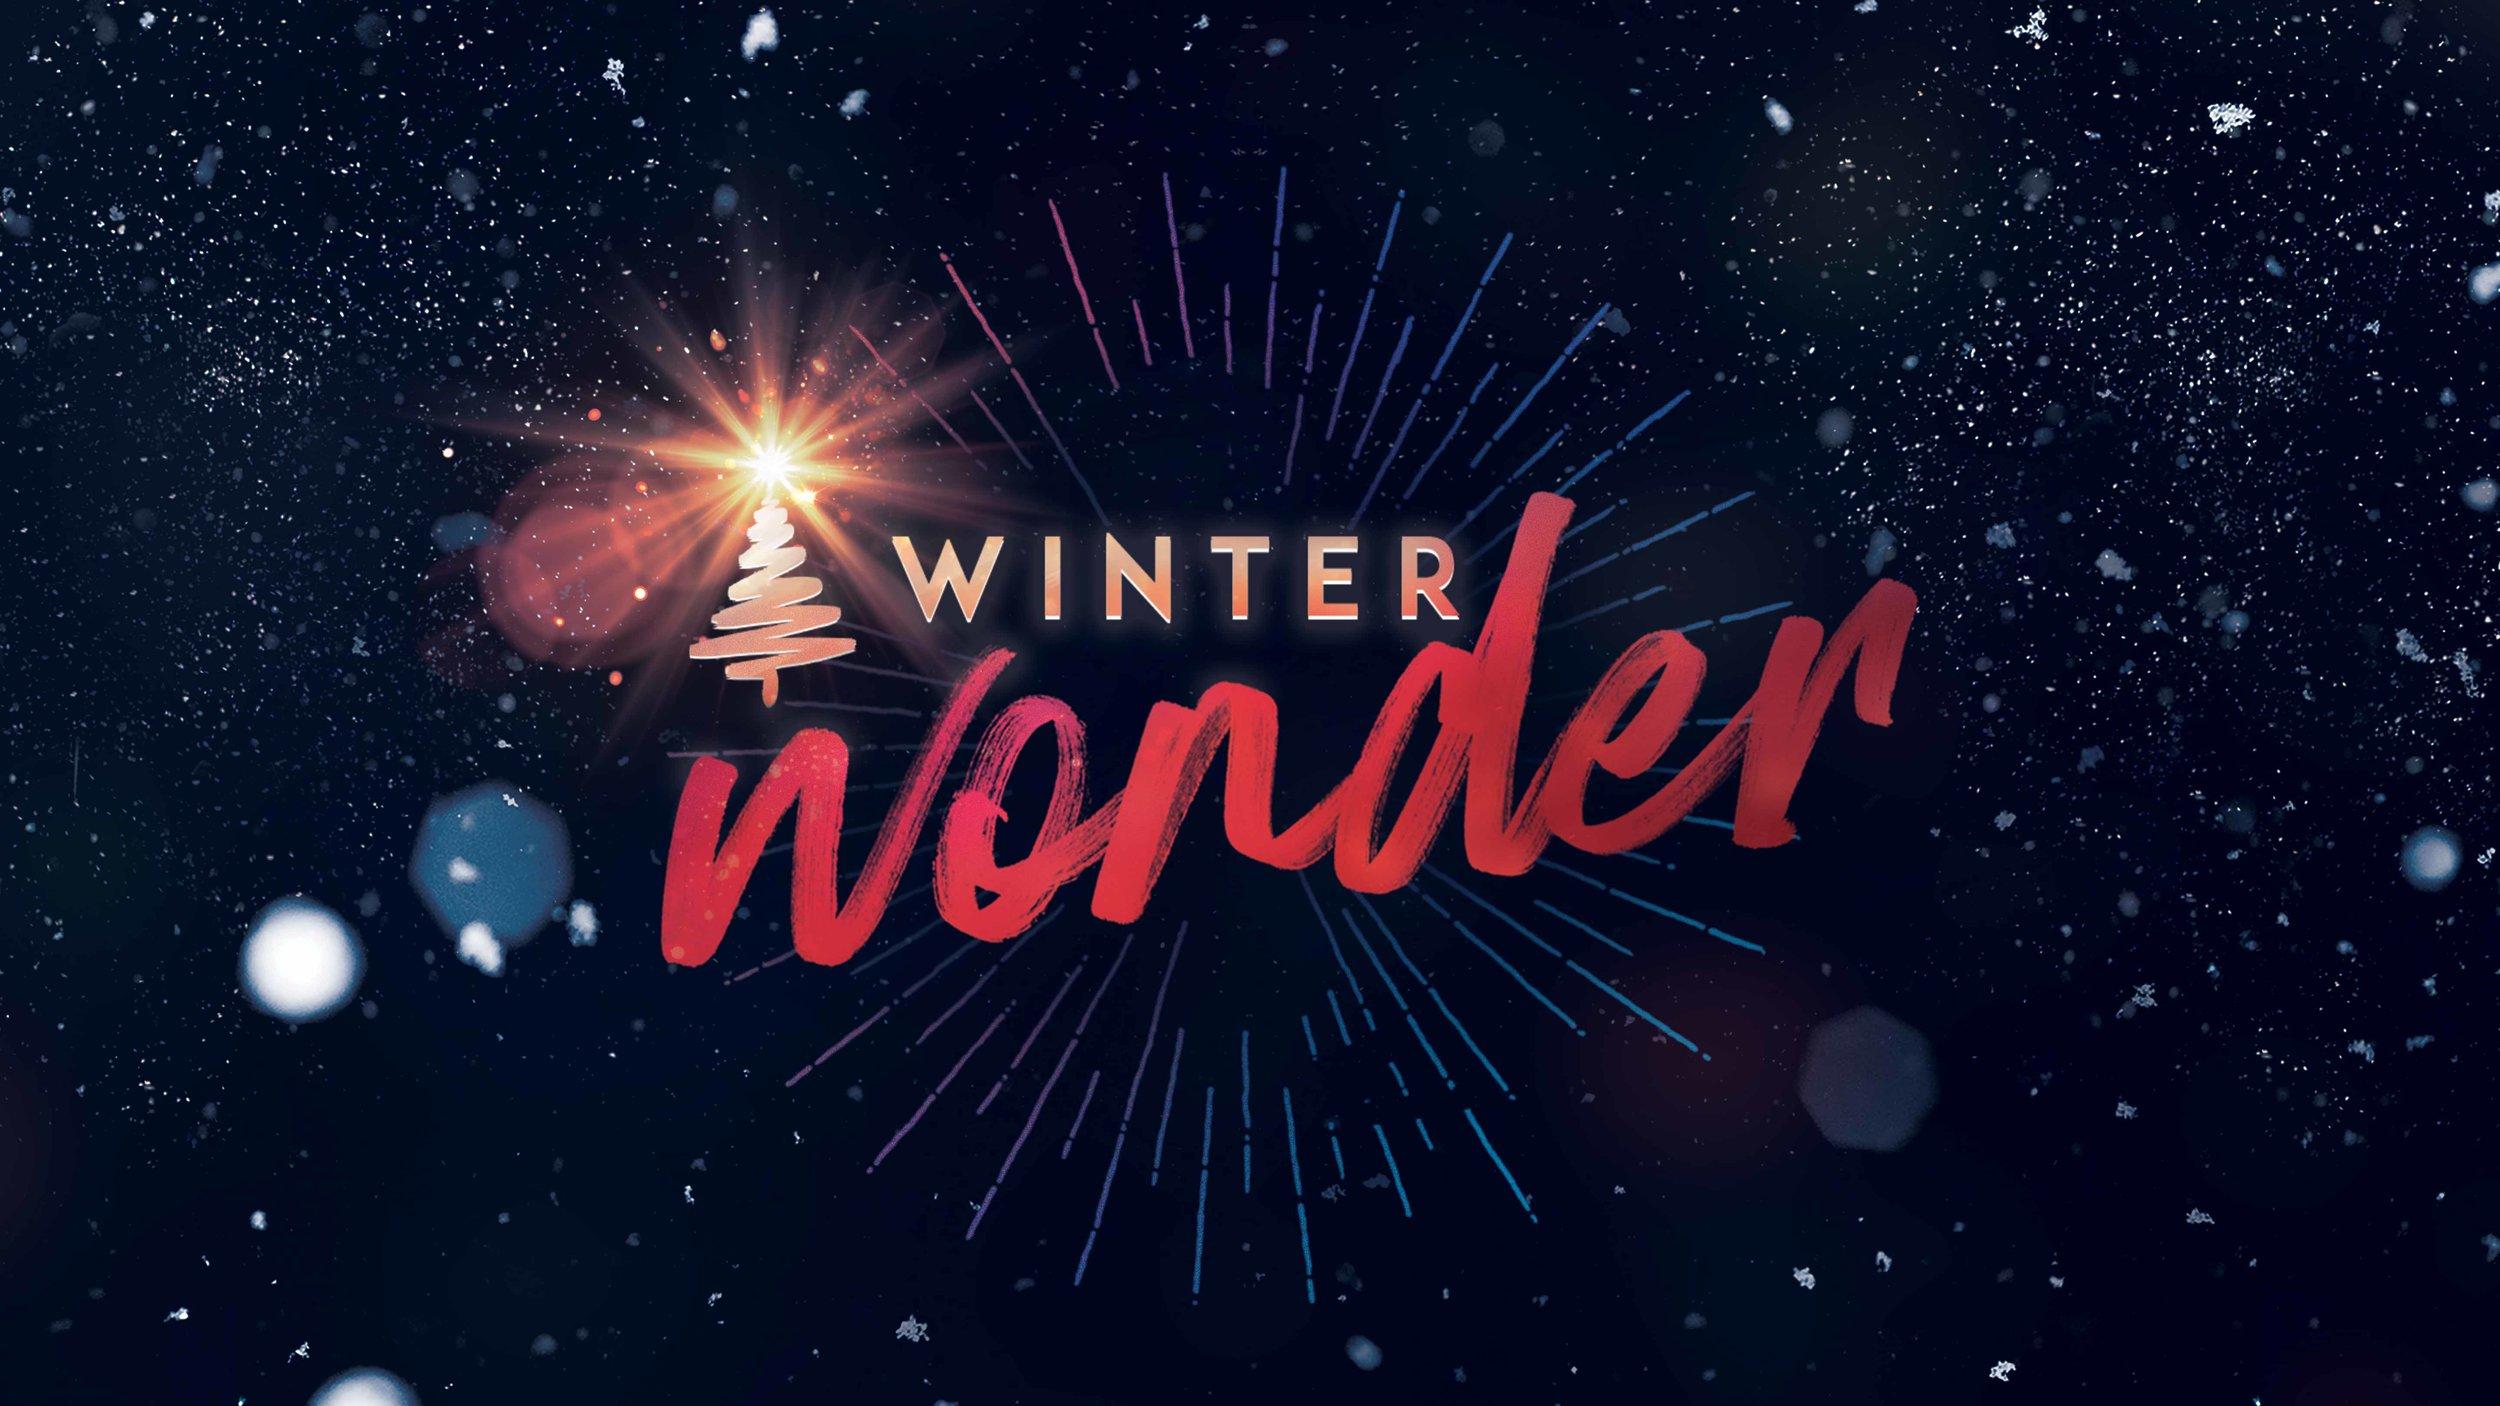 WinterWonder-2019-branding.jpg